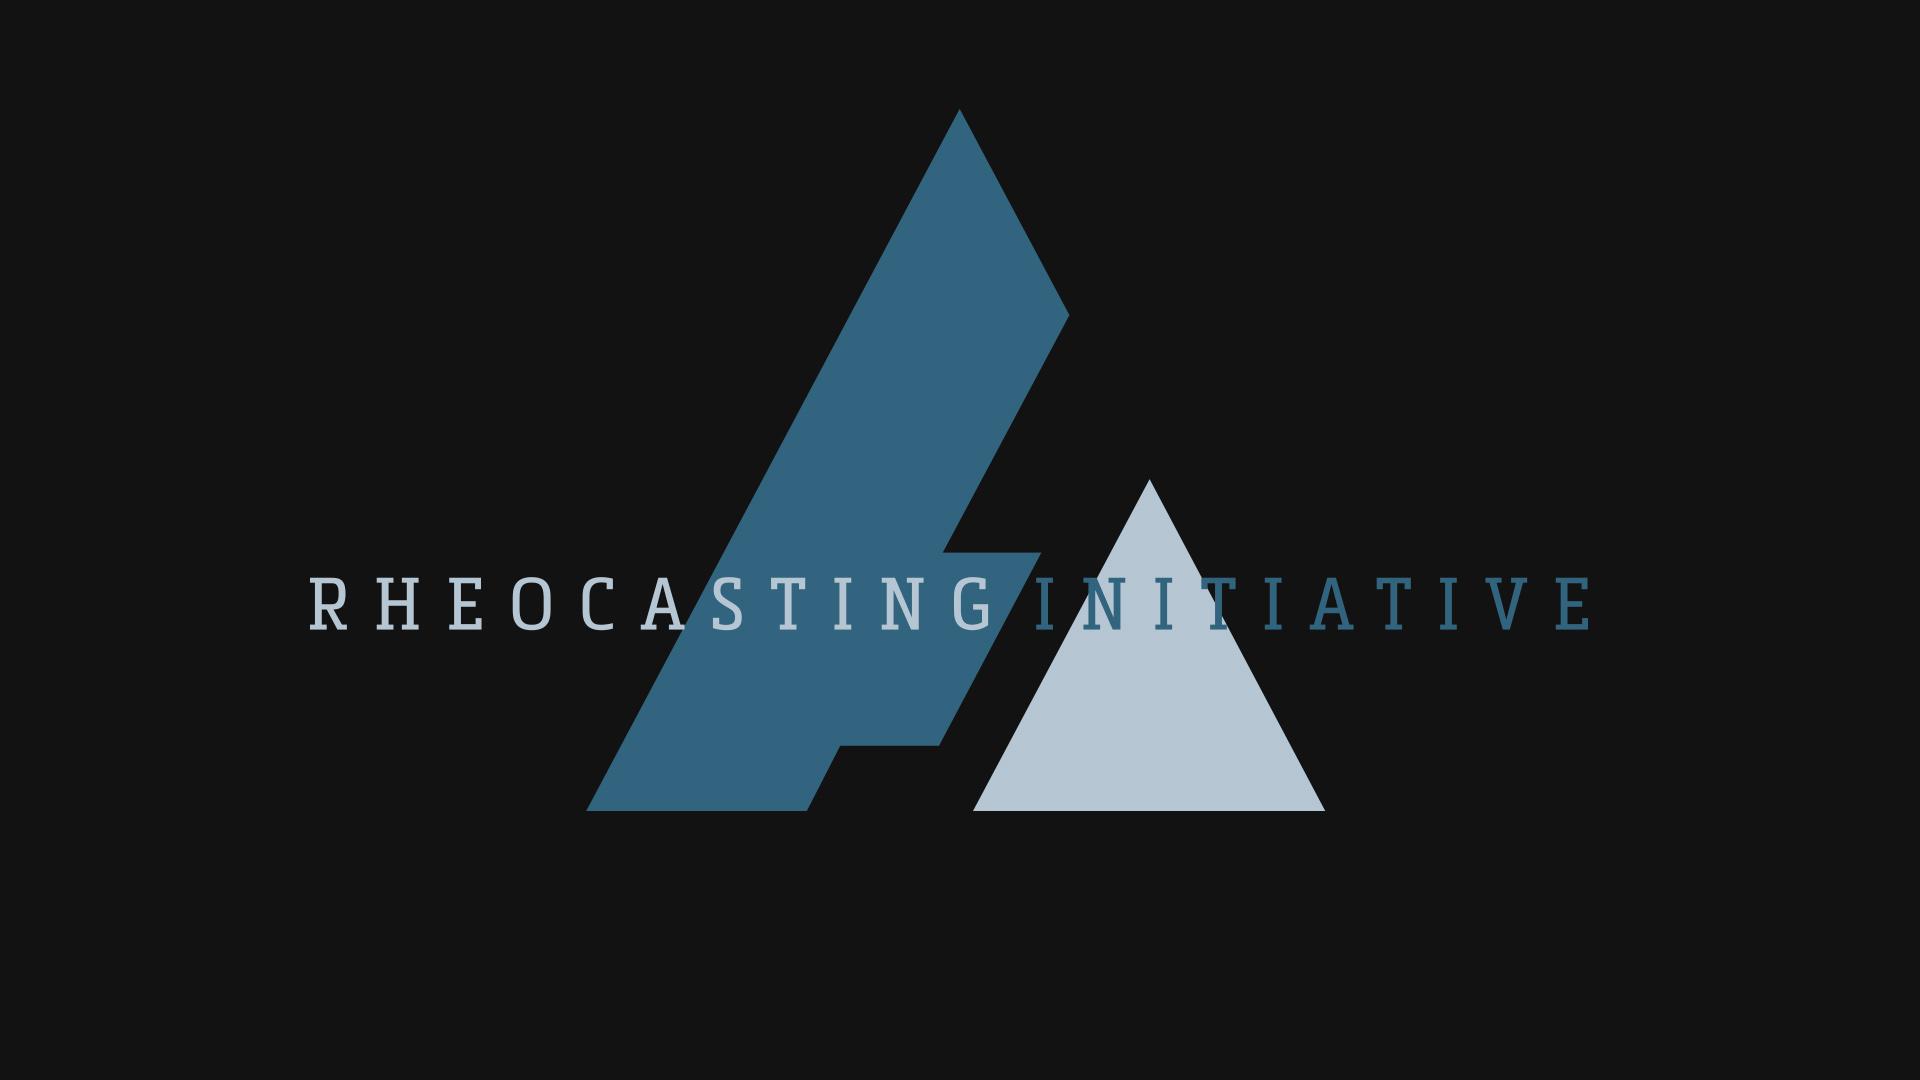 ages_rehocasting_1.jpg